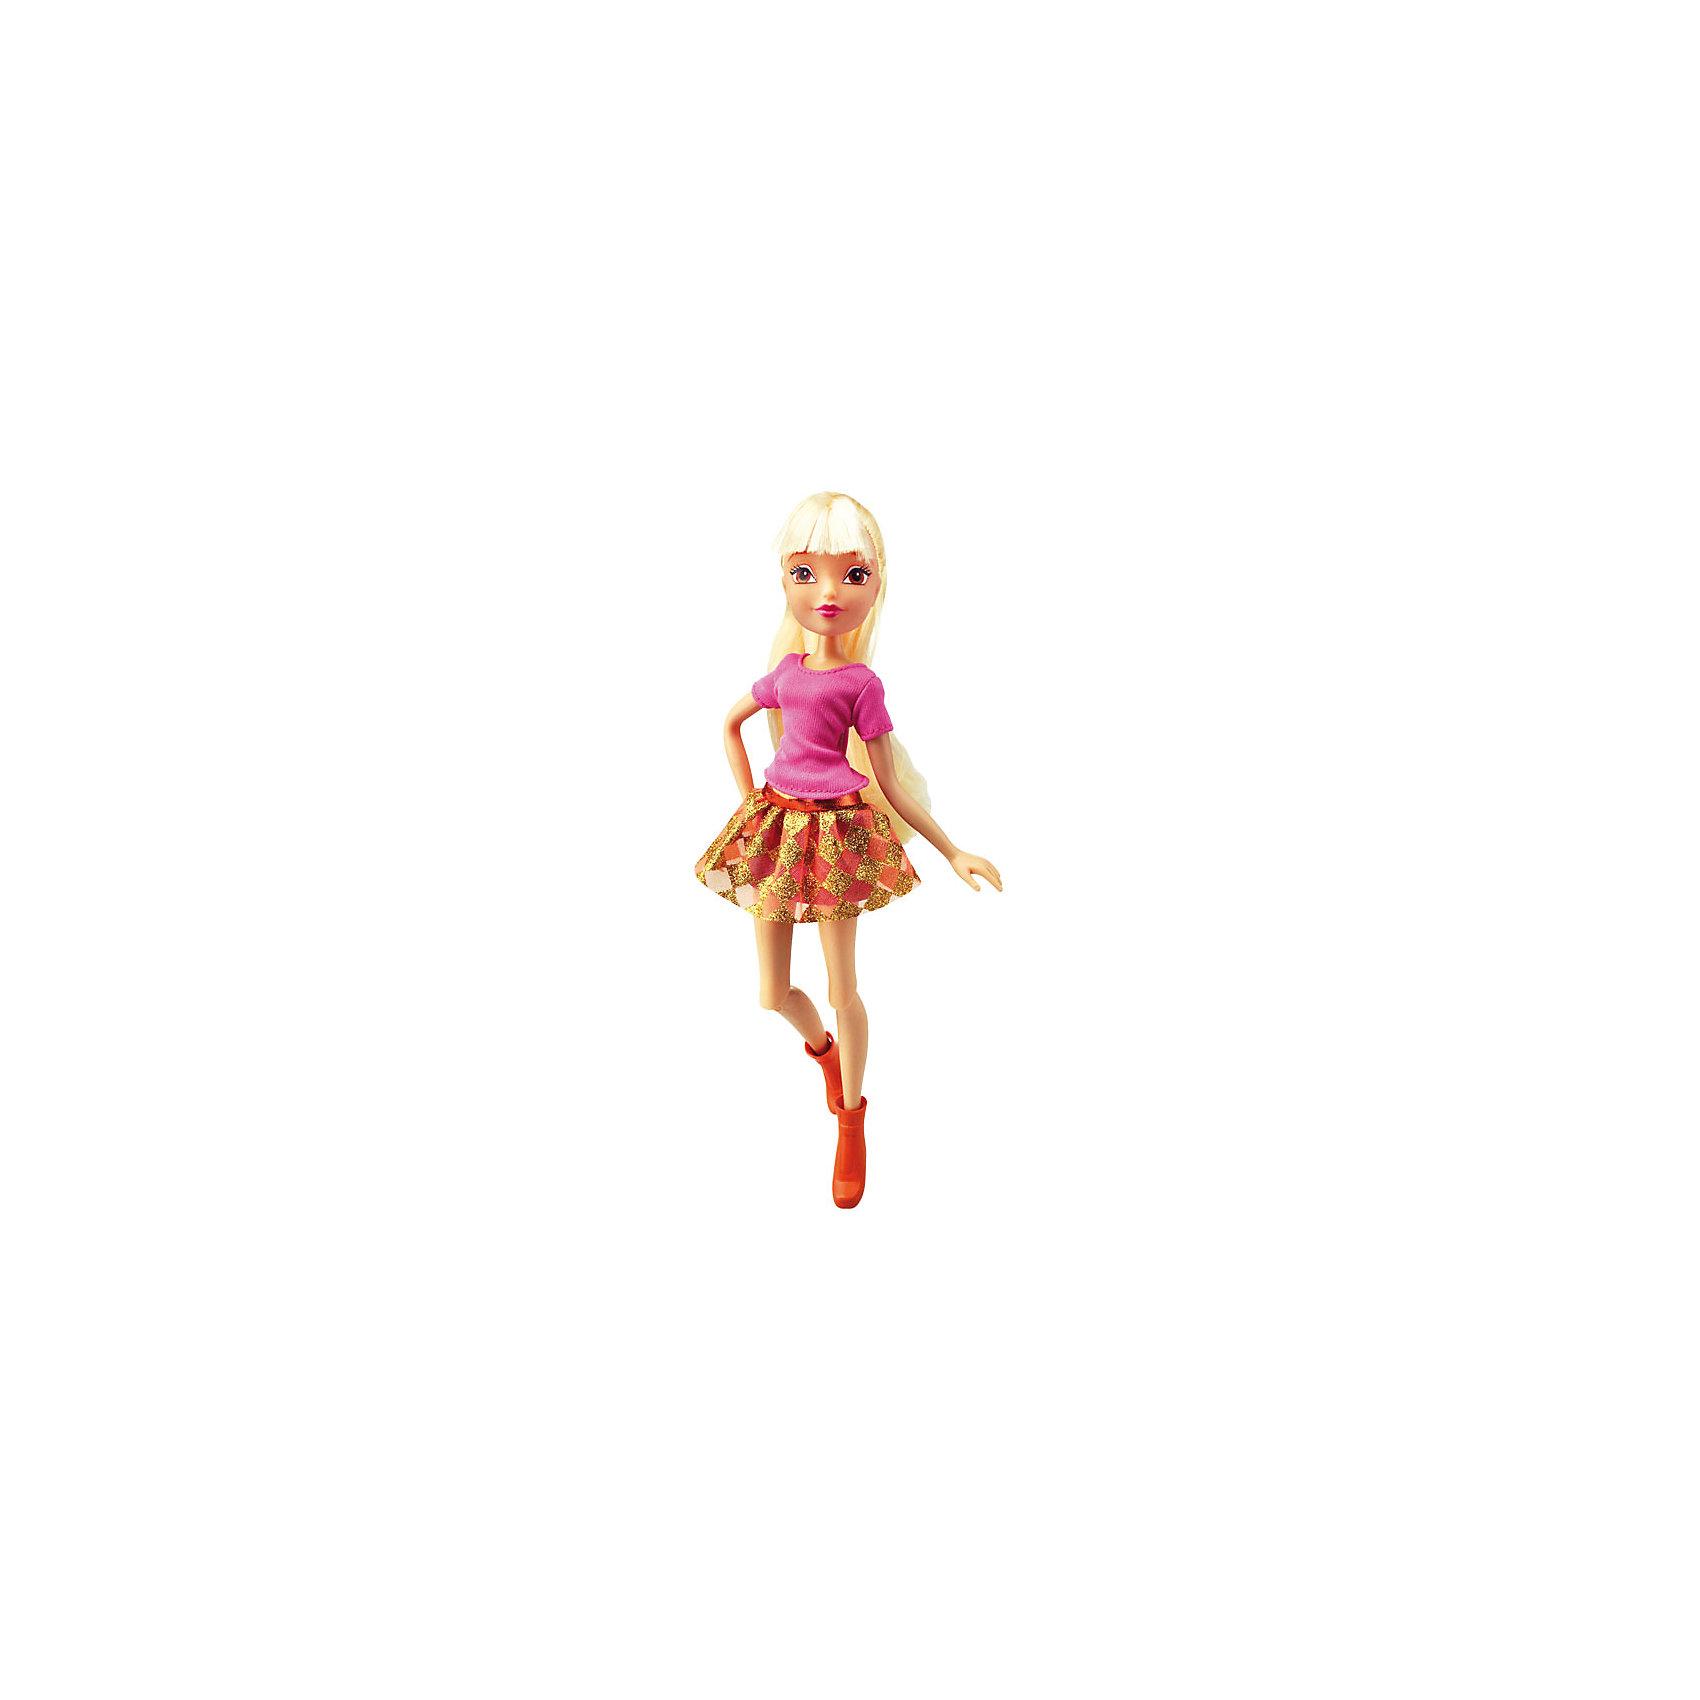 Кукла Городская магия - Стелла, Winx ClubБренды кукол<br><br><br>Ширина мм: 190<br>Глубина мм: 320<br>Высота мм: 60<br>Вес г: 256<br>Возраст от месяцев: 36<br>Возраст до месяцев: 120<br>Пол: Женский<br>Возраст: Детский<br>SKU: 5383946